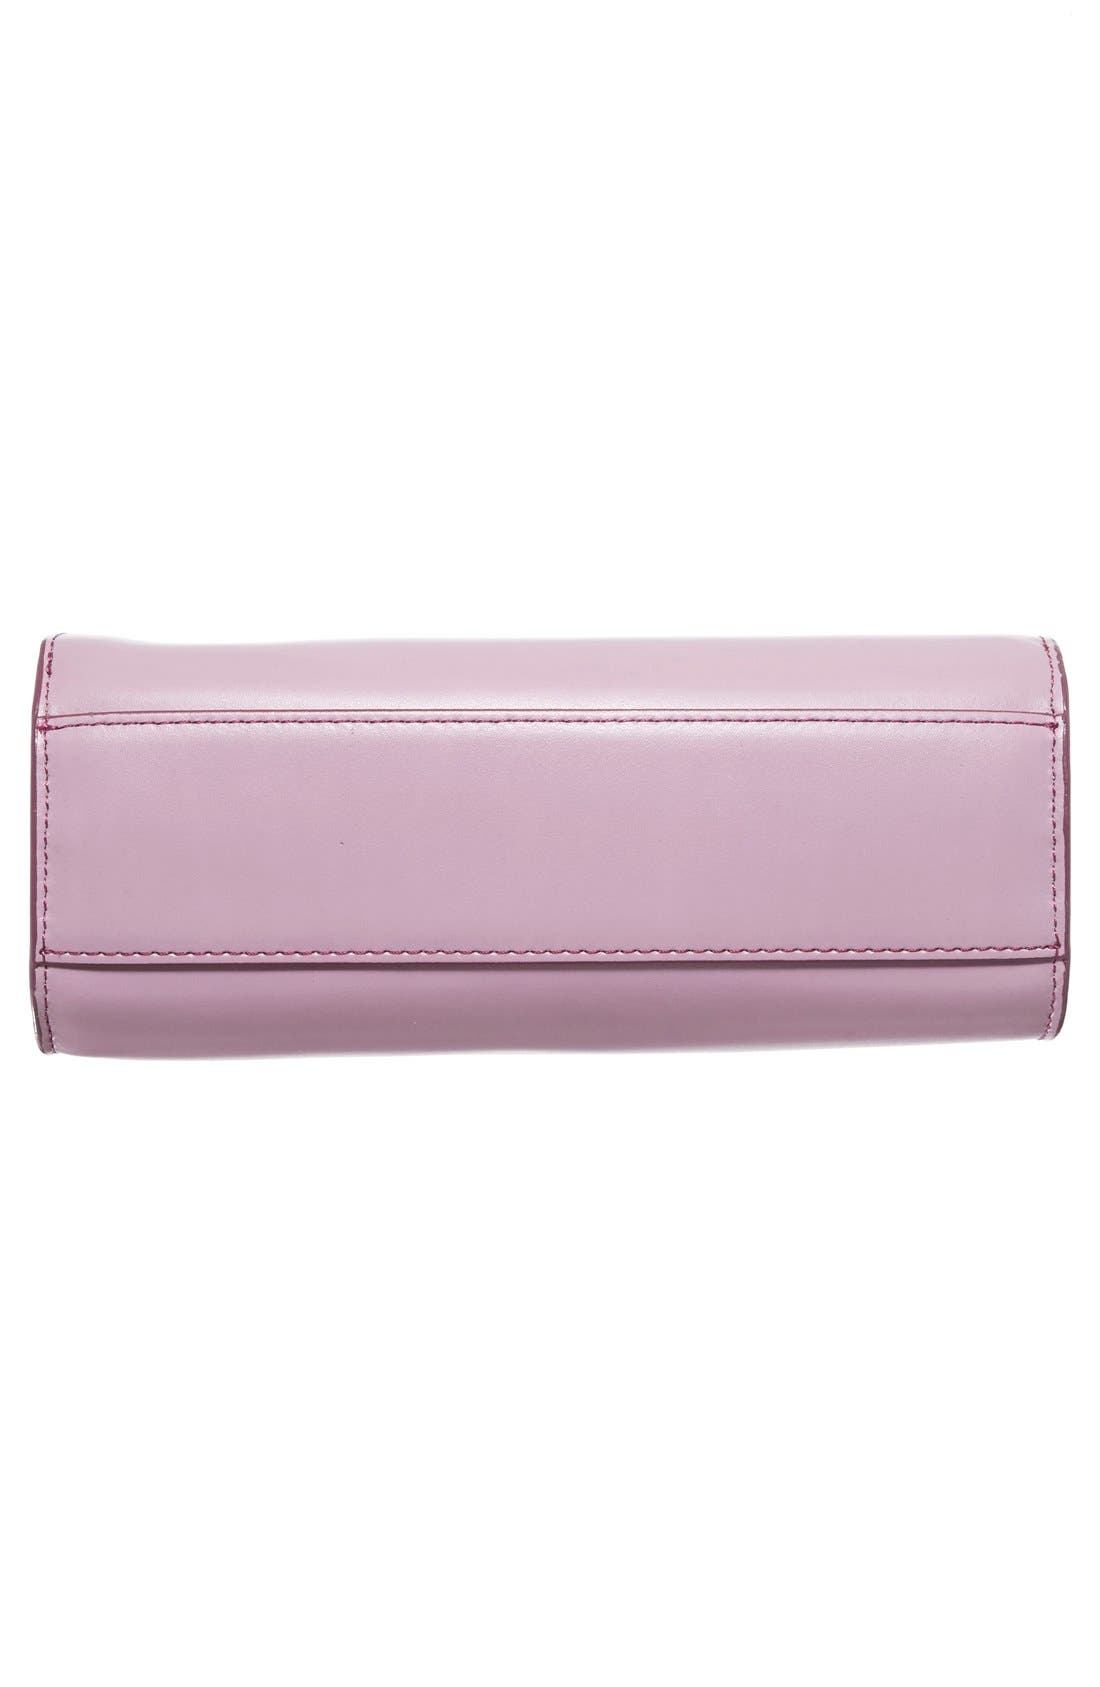 Lodis'Audrey Collection -Vicky' ConvertibleCrossbody Bag,                             Alternate thumbnail 12, color,